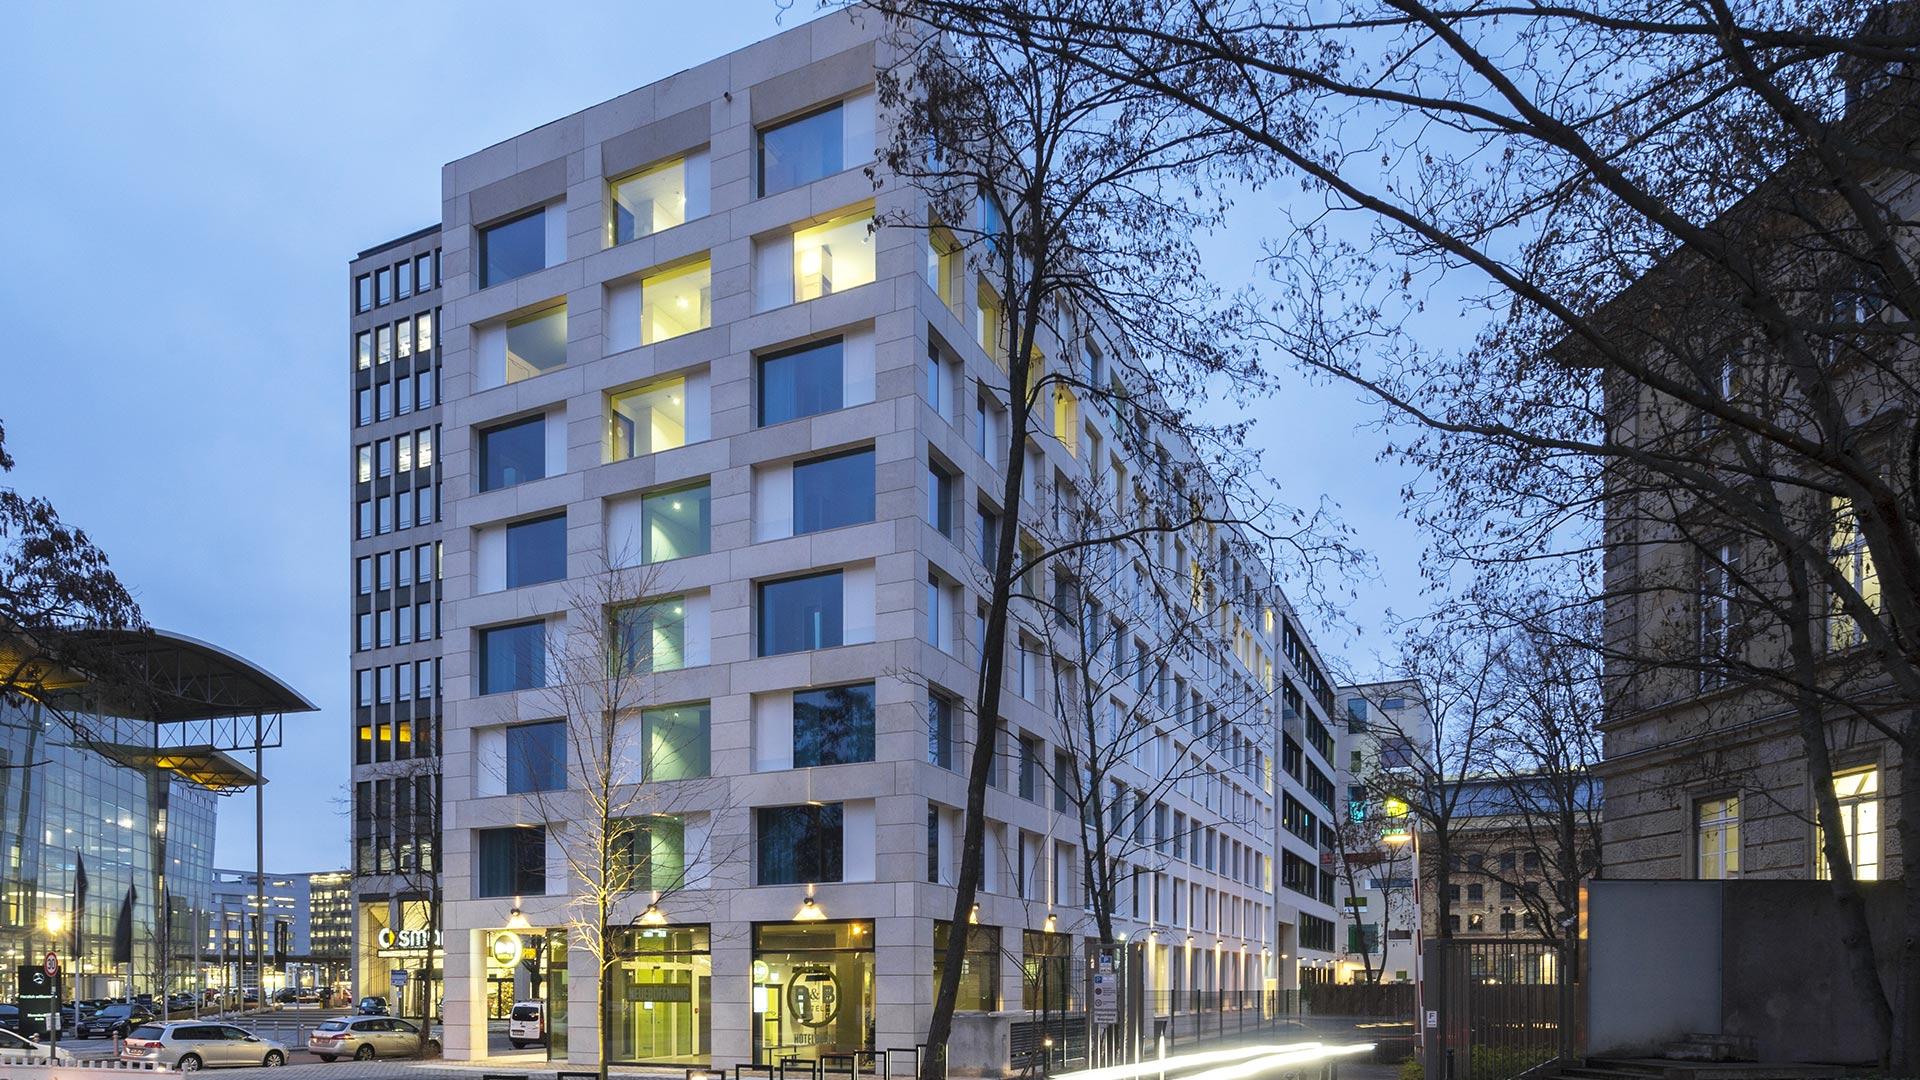 Hôtel B&B, Berlin Tiergarten